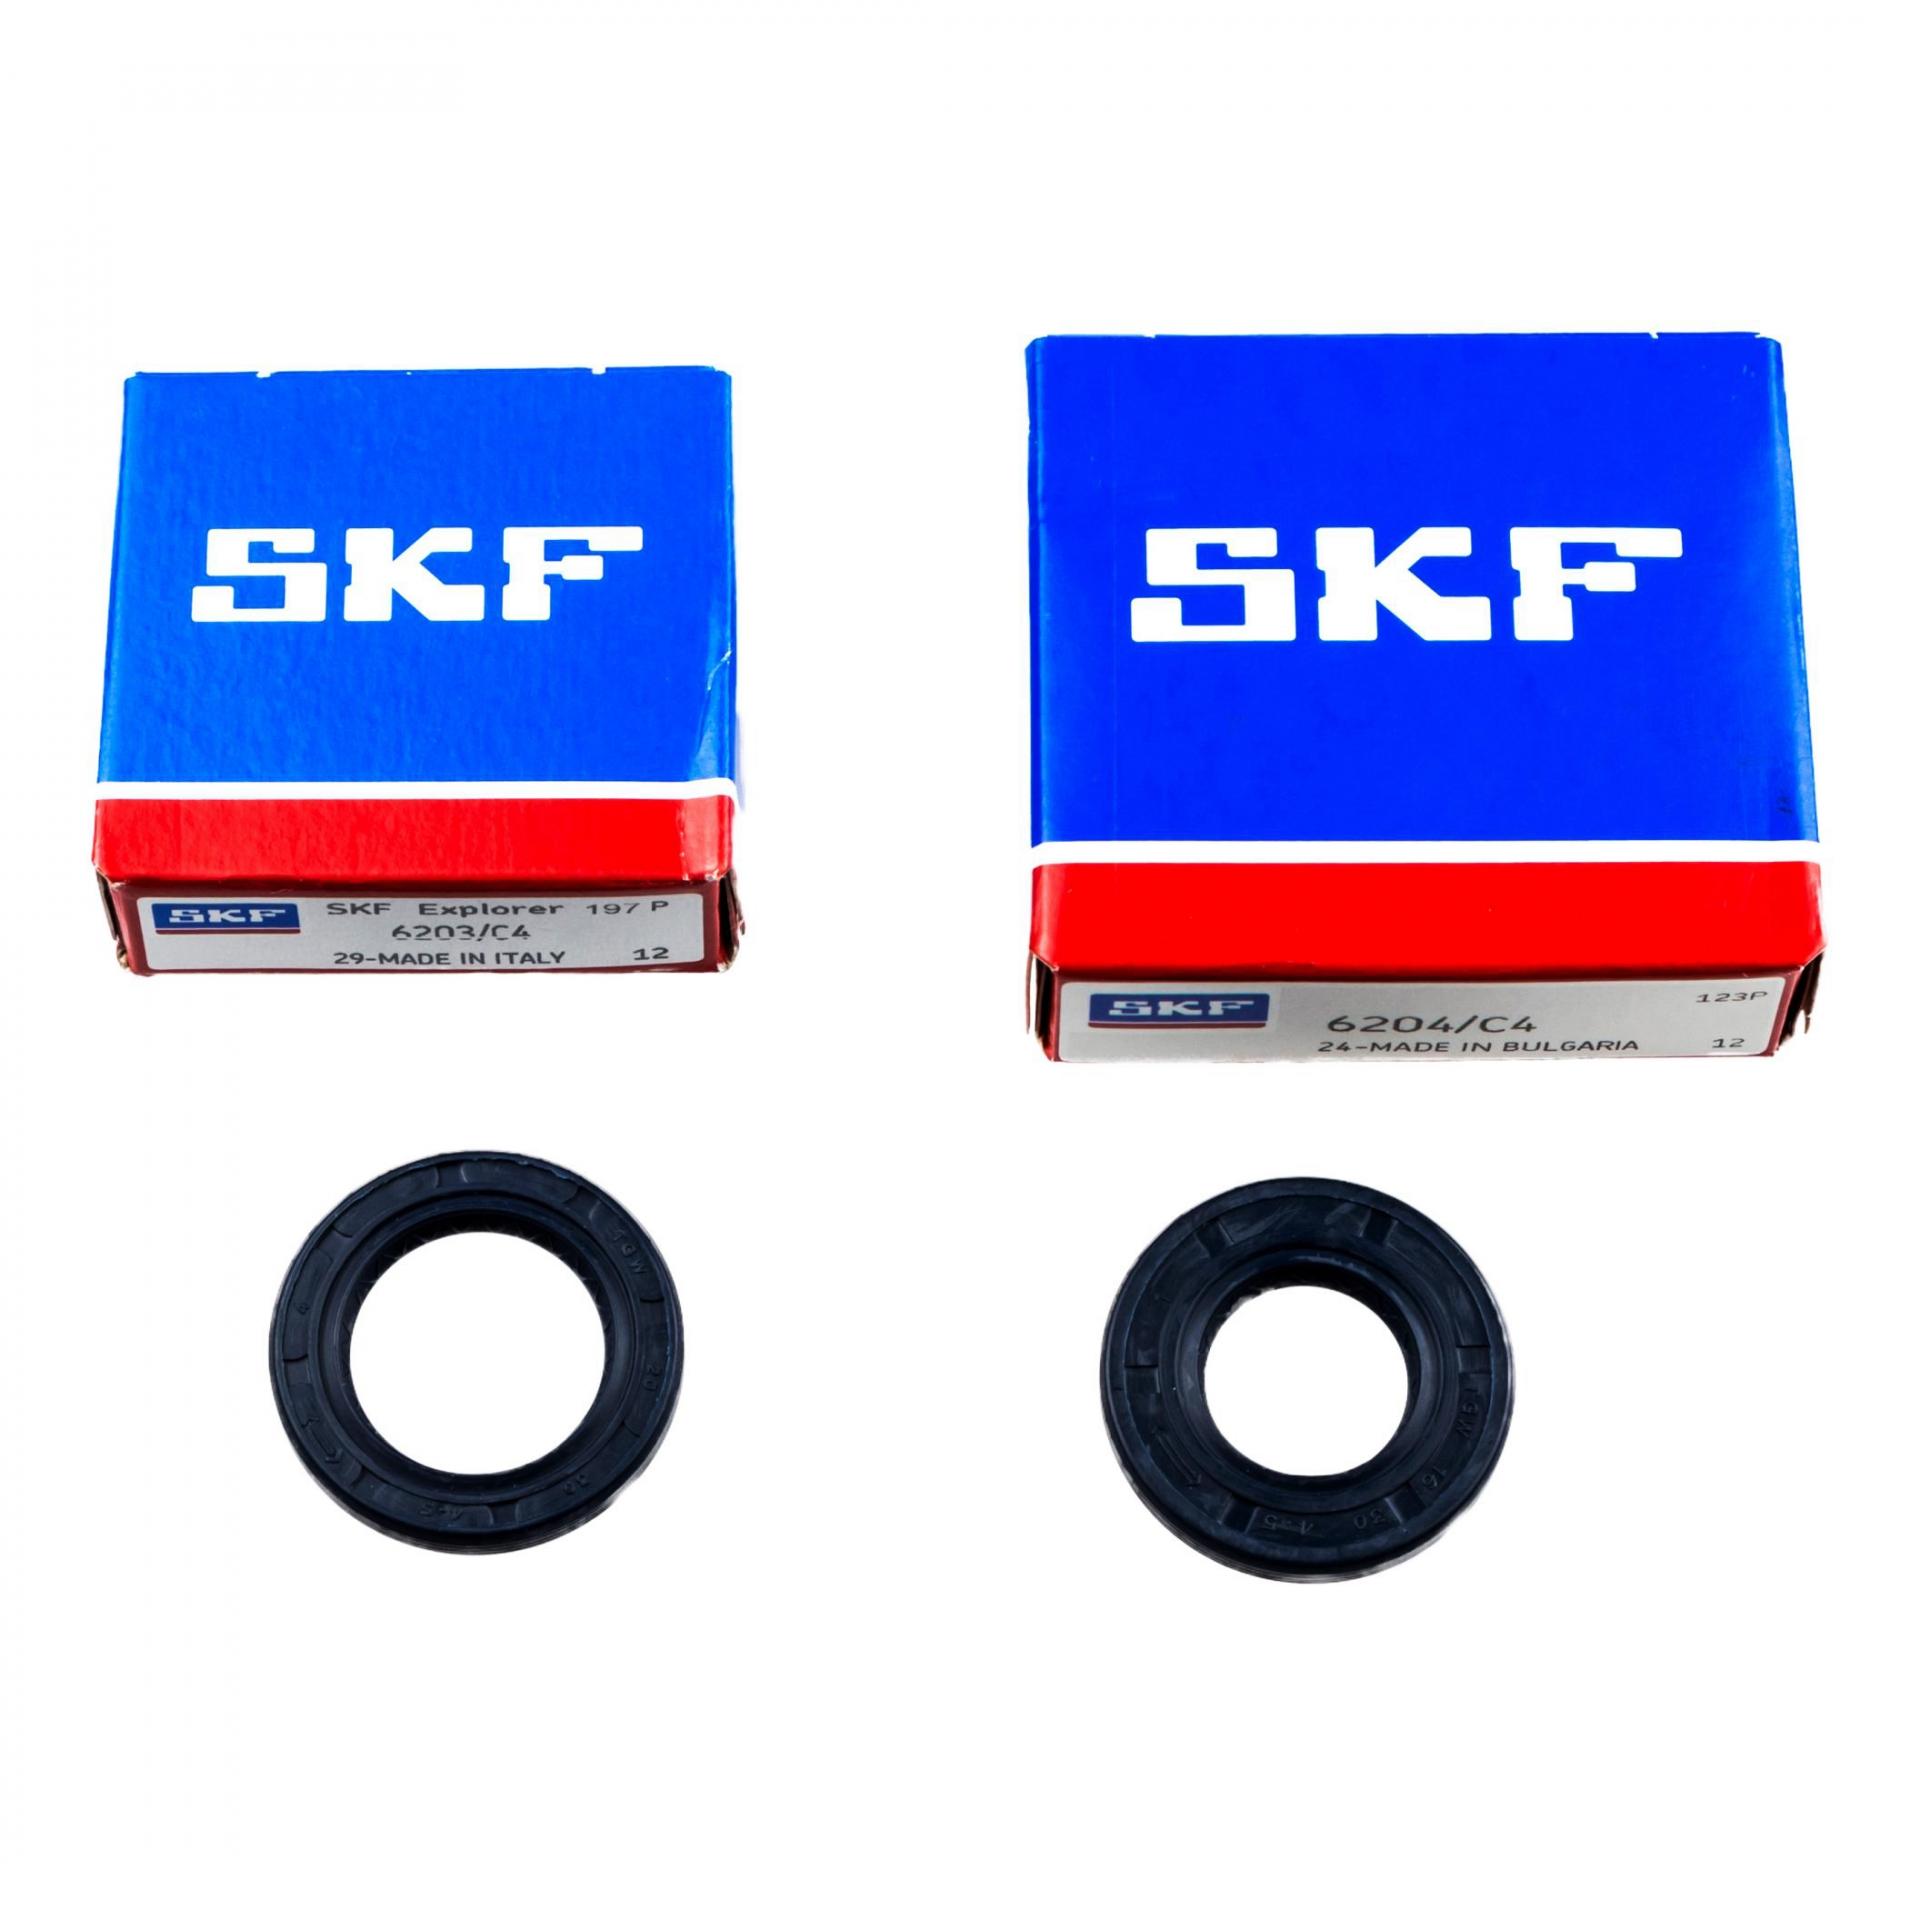 Kit roulements et spy SKF C4 Peugeot 103